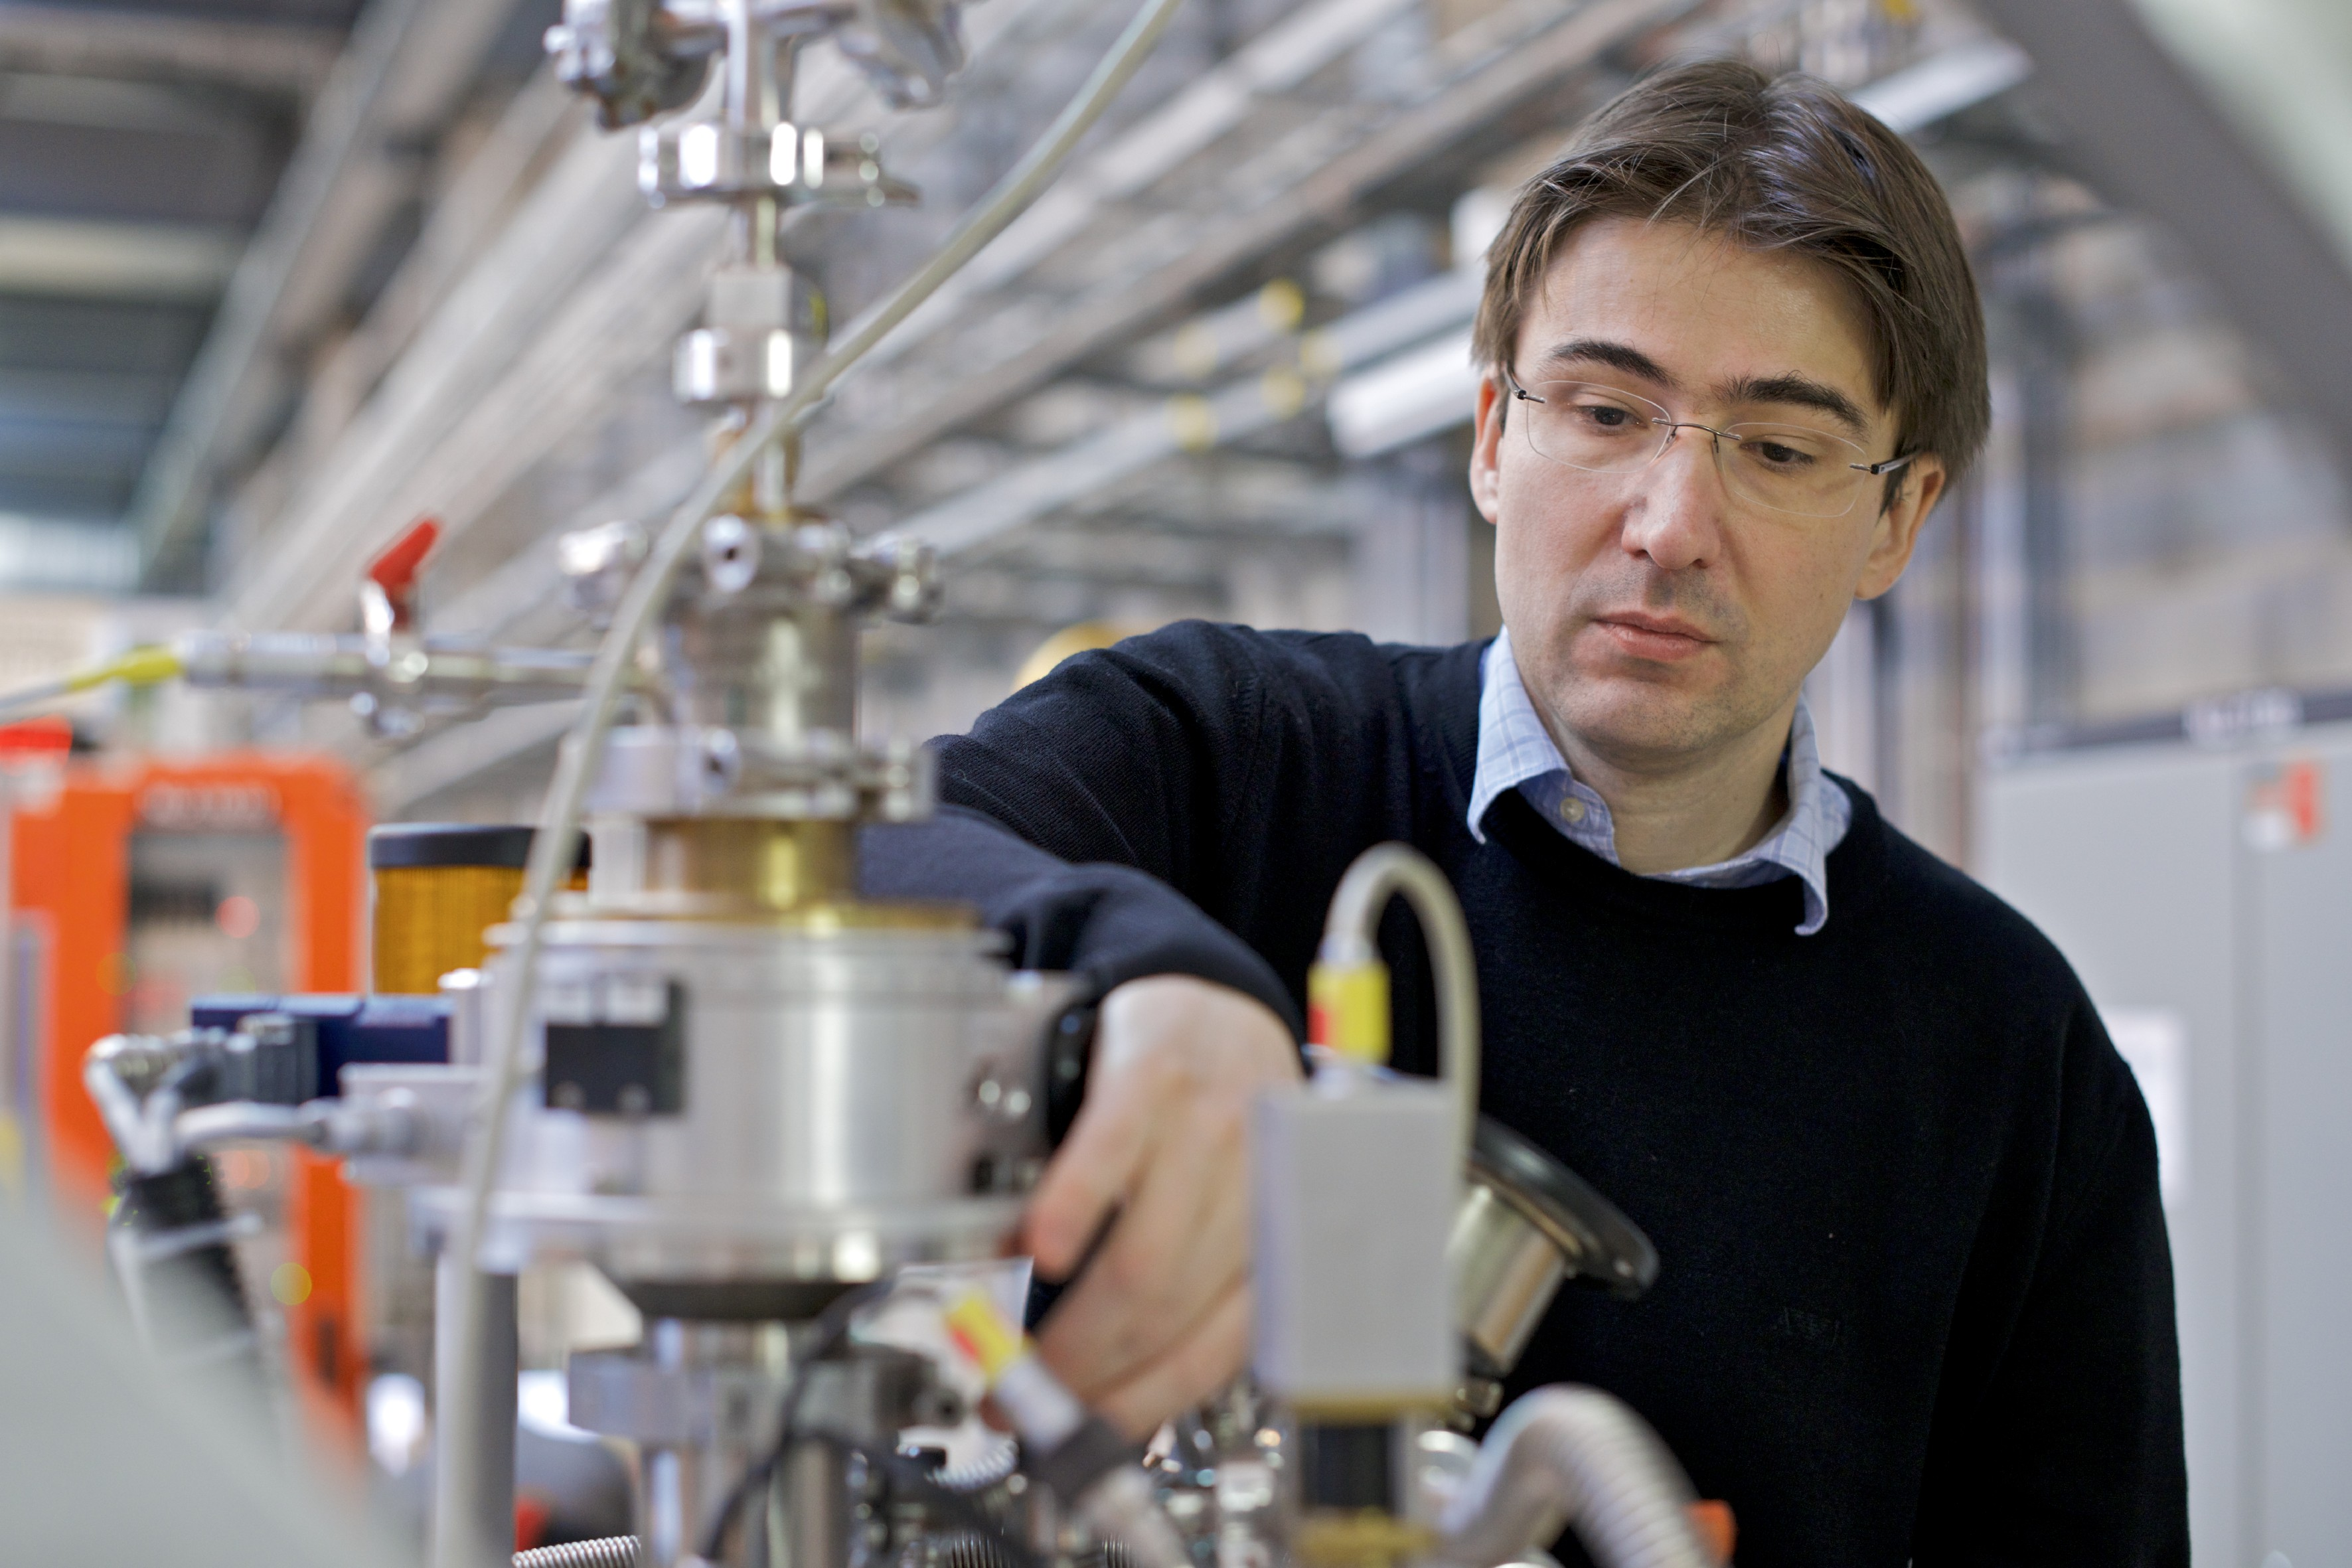 Michel Kenzelmann, head of the Laboratory for Scientific Developments and Novel Materials at PSI. (Photo: Paul Scherrer Institute/Markus Fischer)